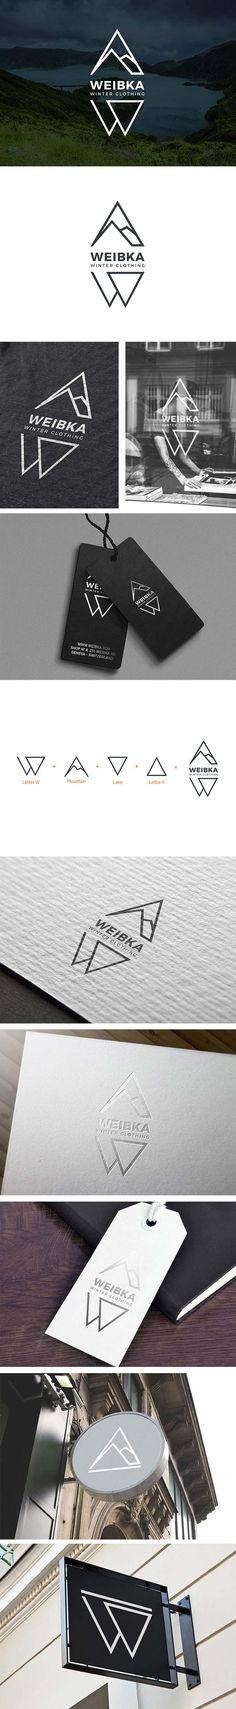 Logo Design Fashion, Clothing & Sport Brand Identity | Letter W, Letter A, Geometric, Triangle, mountain, lake, mark, branding | Valhalla Creative Design, Perth